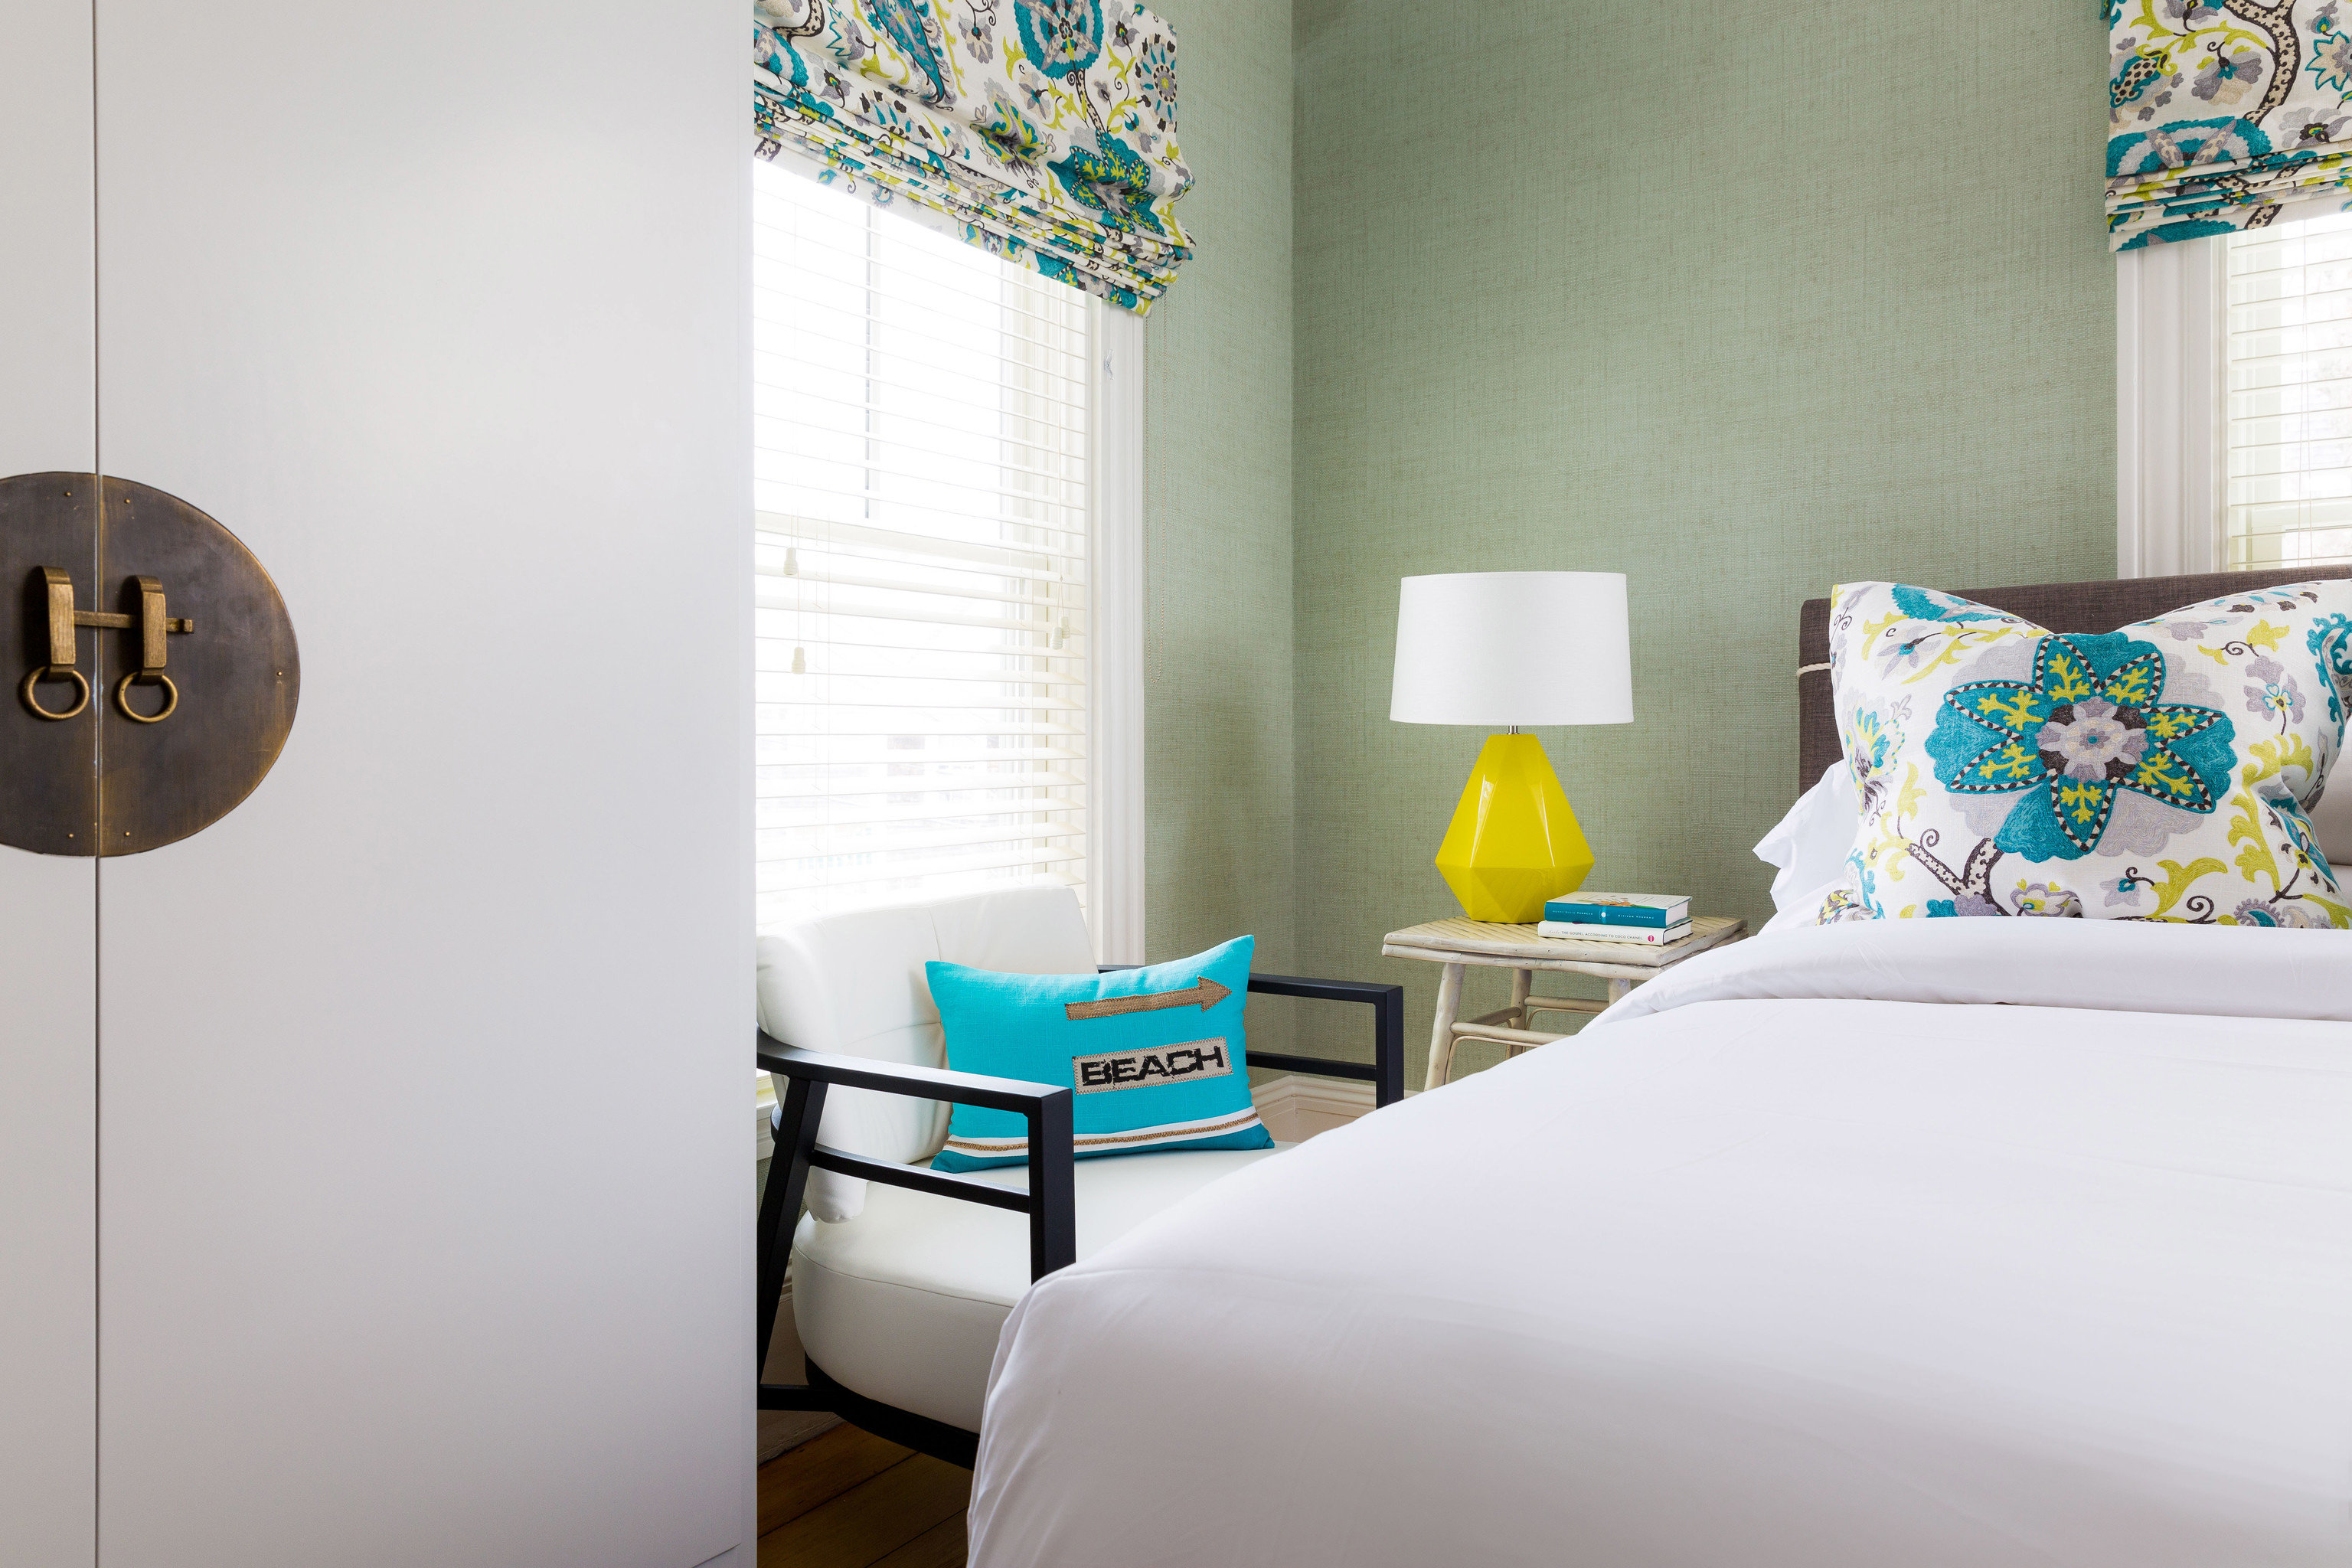 Bedroom living room home pillow bed sheet